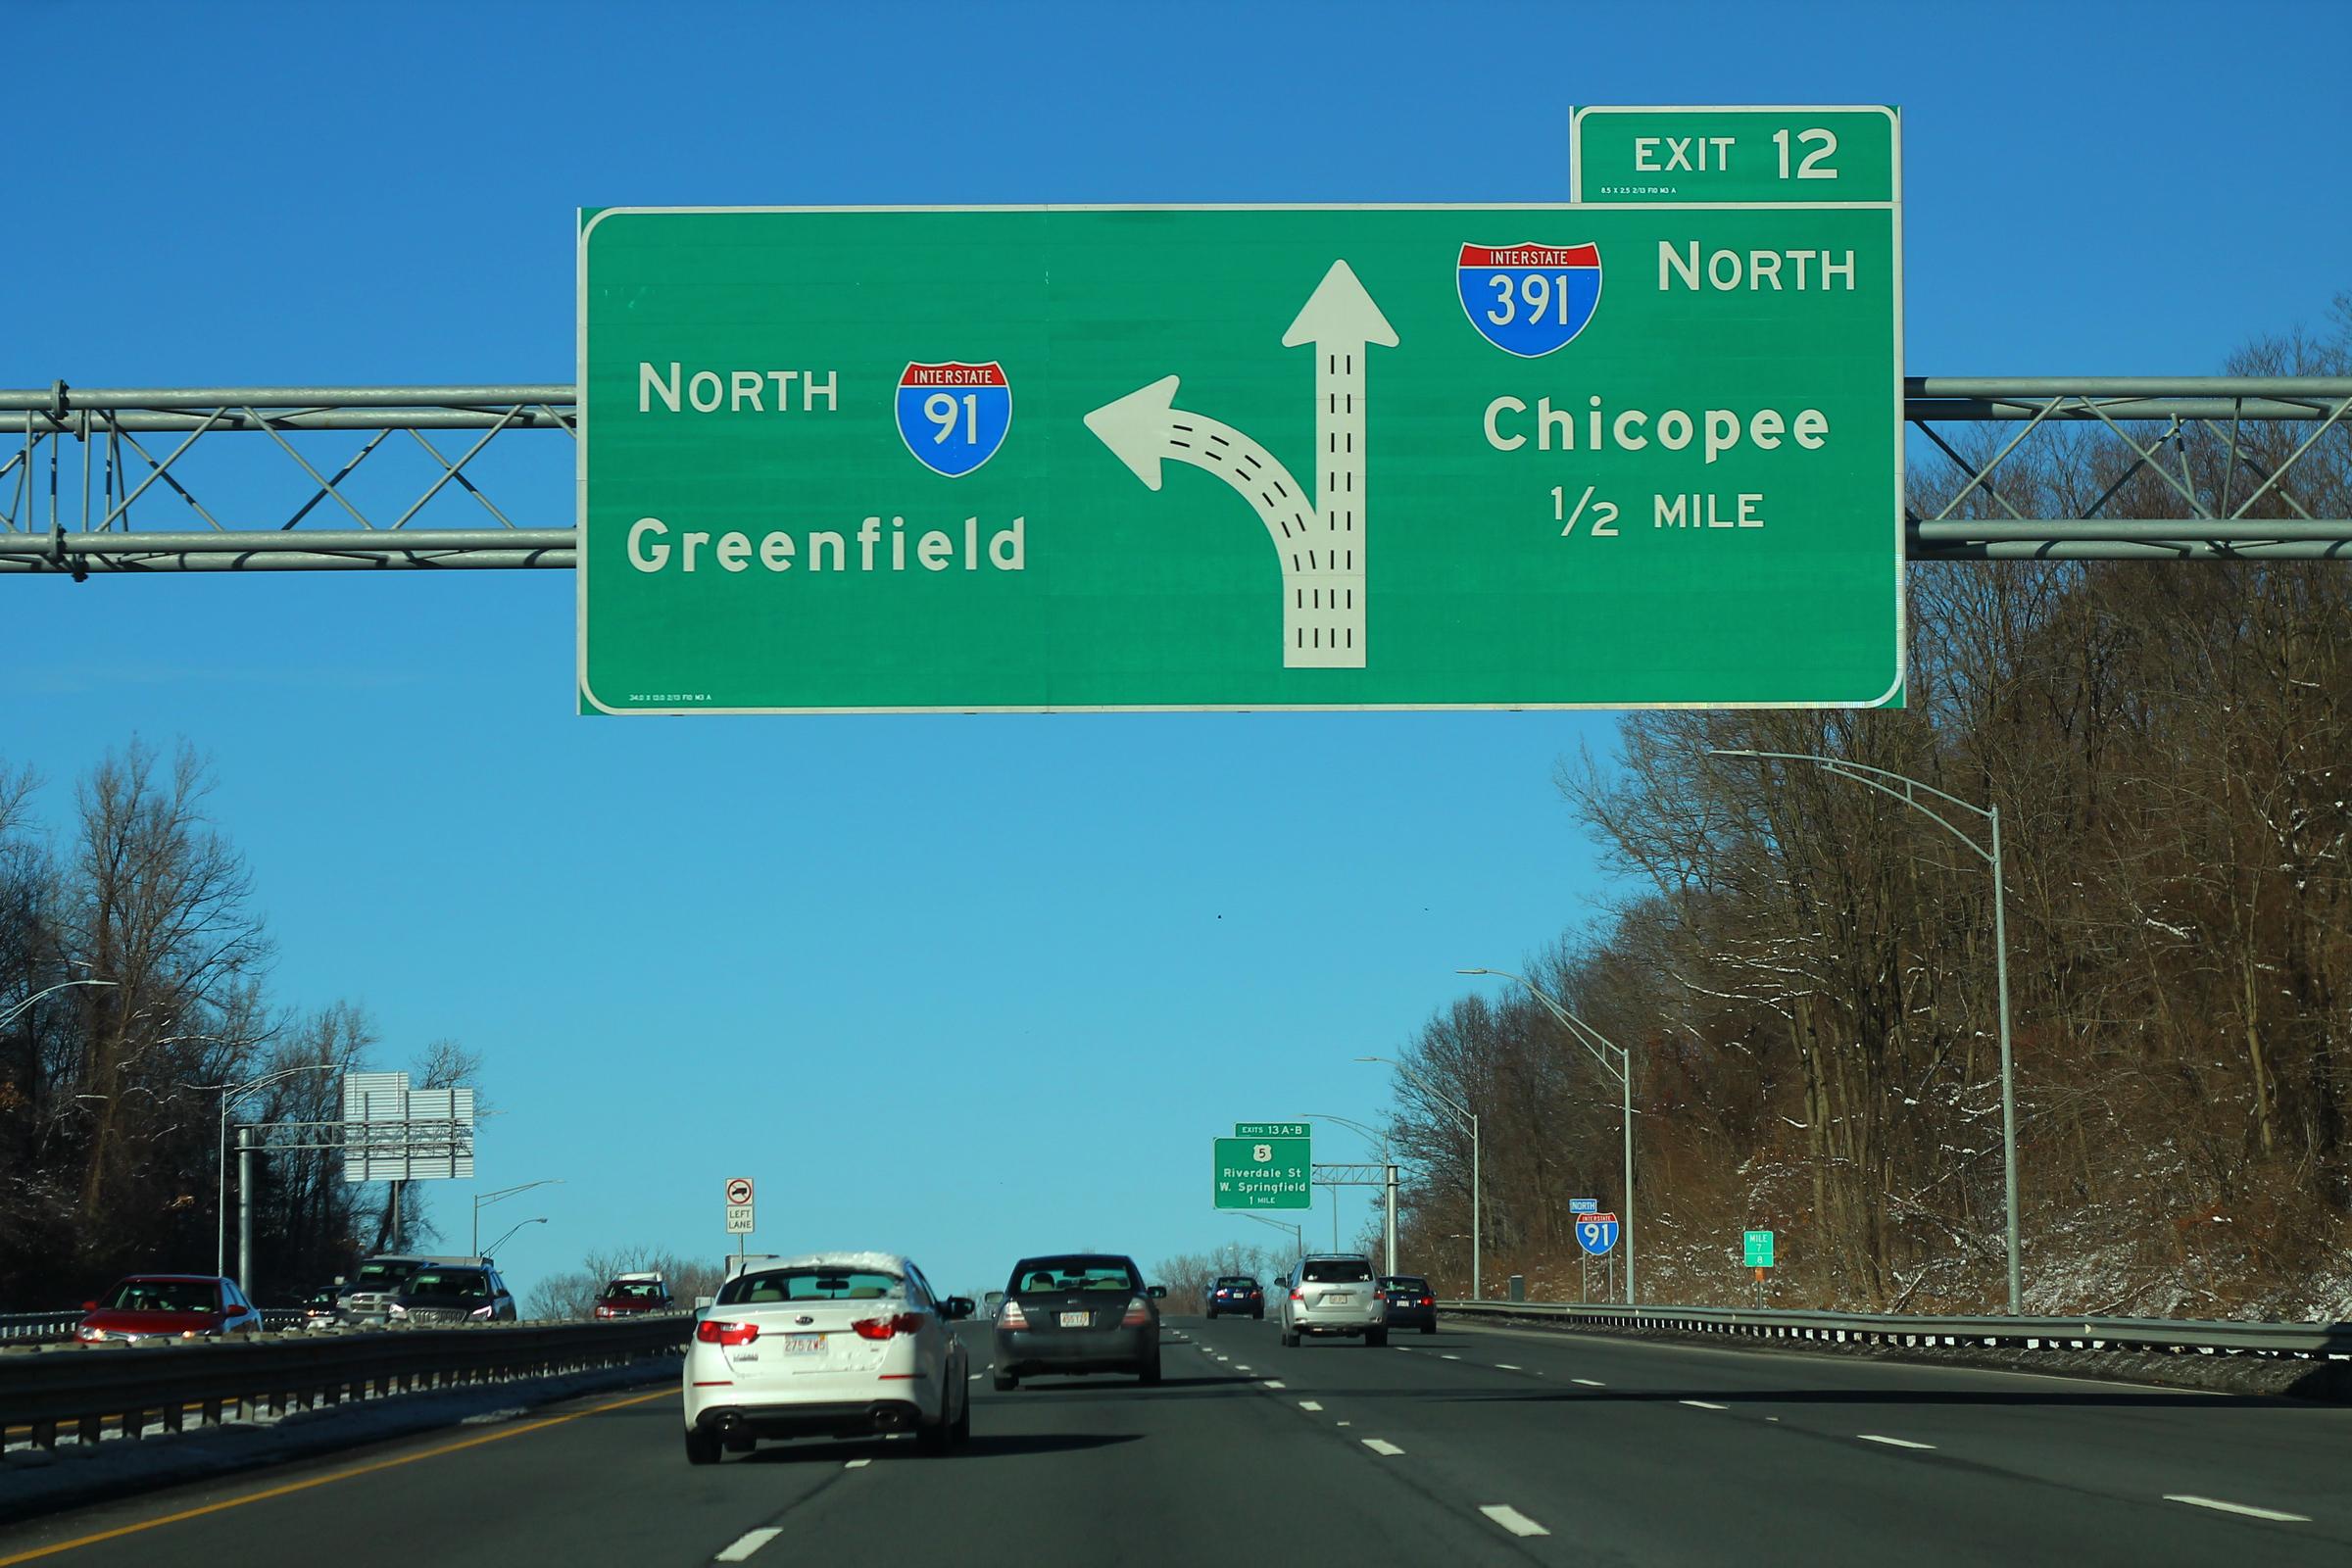 File:I-91 North - Exit 12 - Interstate 391 North